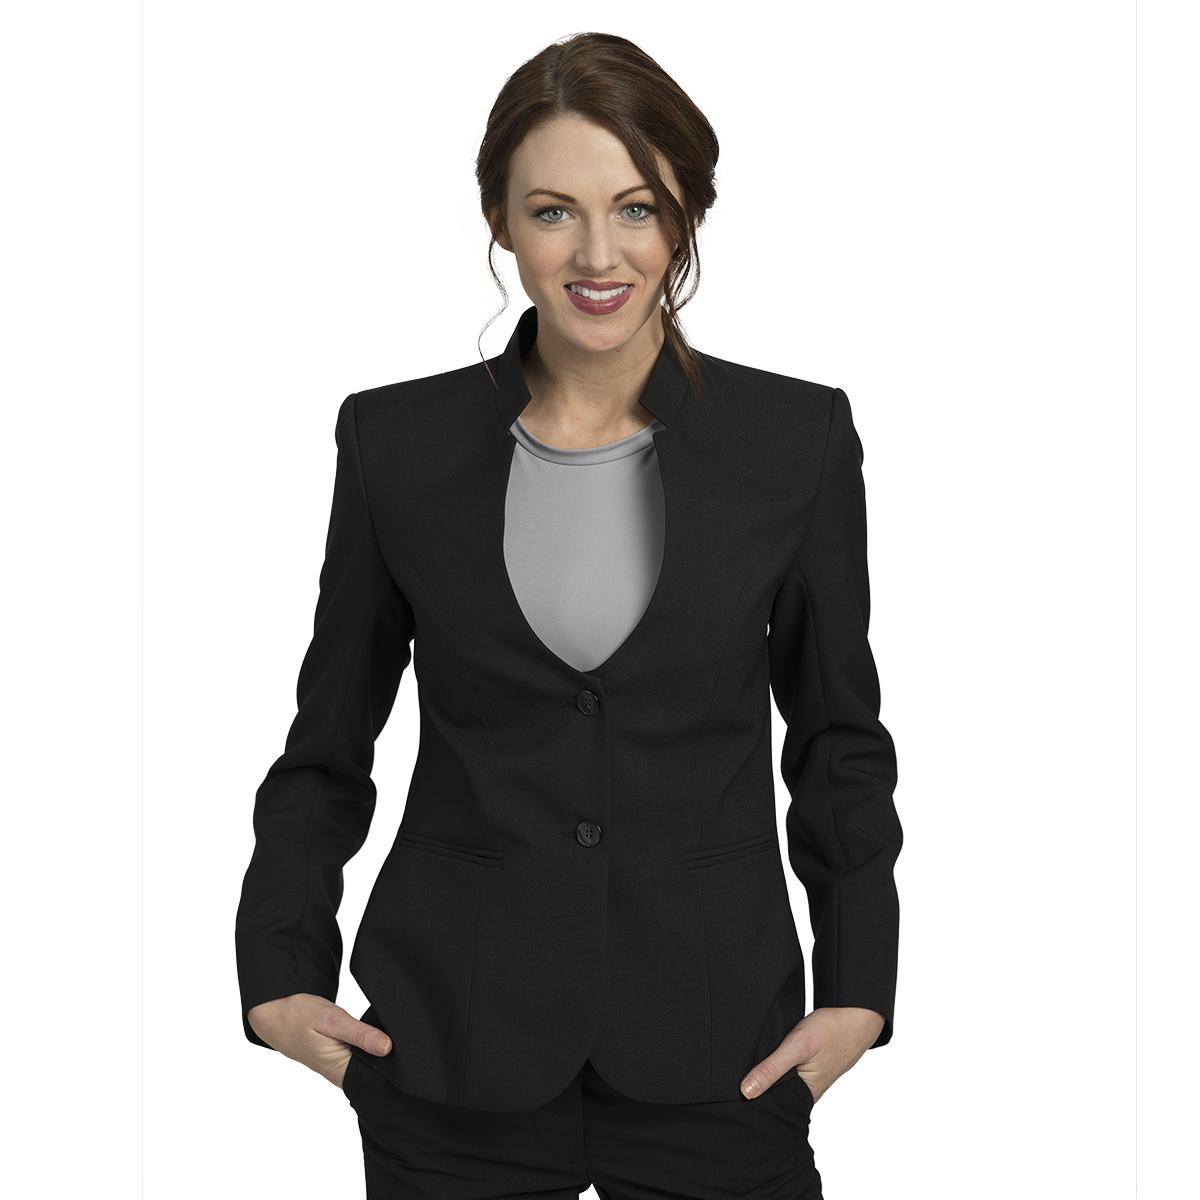 Women's UltraLux Mandarin Collar Blazer – Executive Apparel